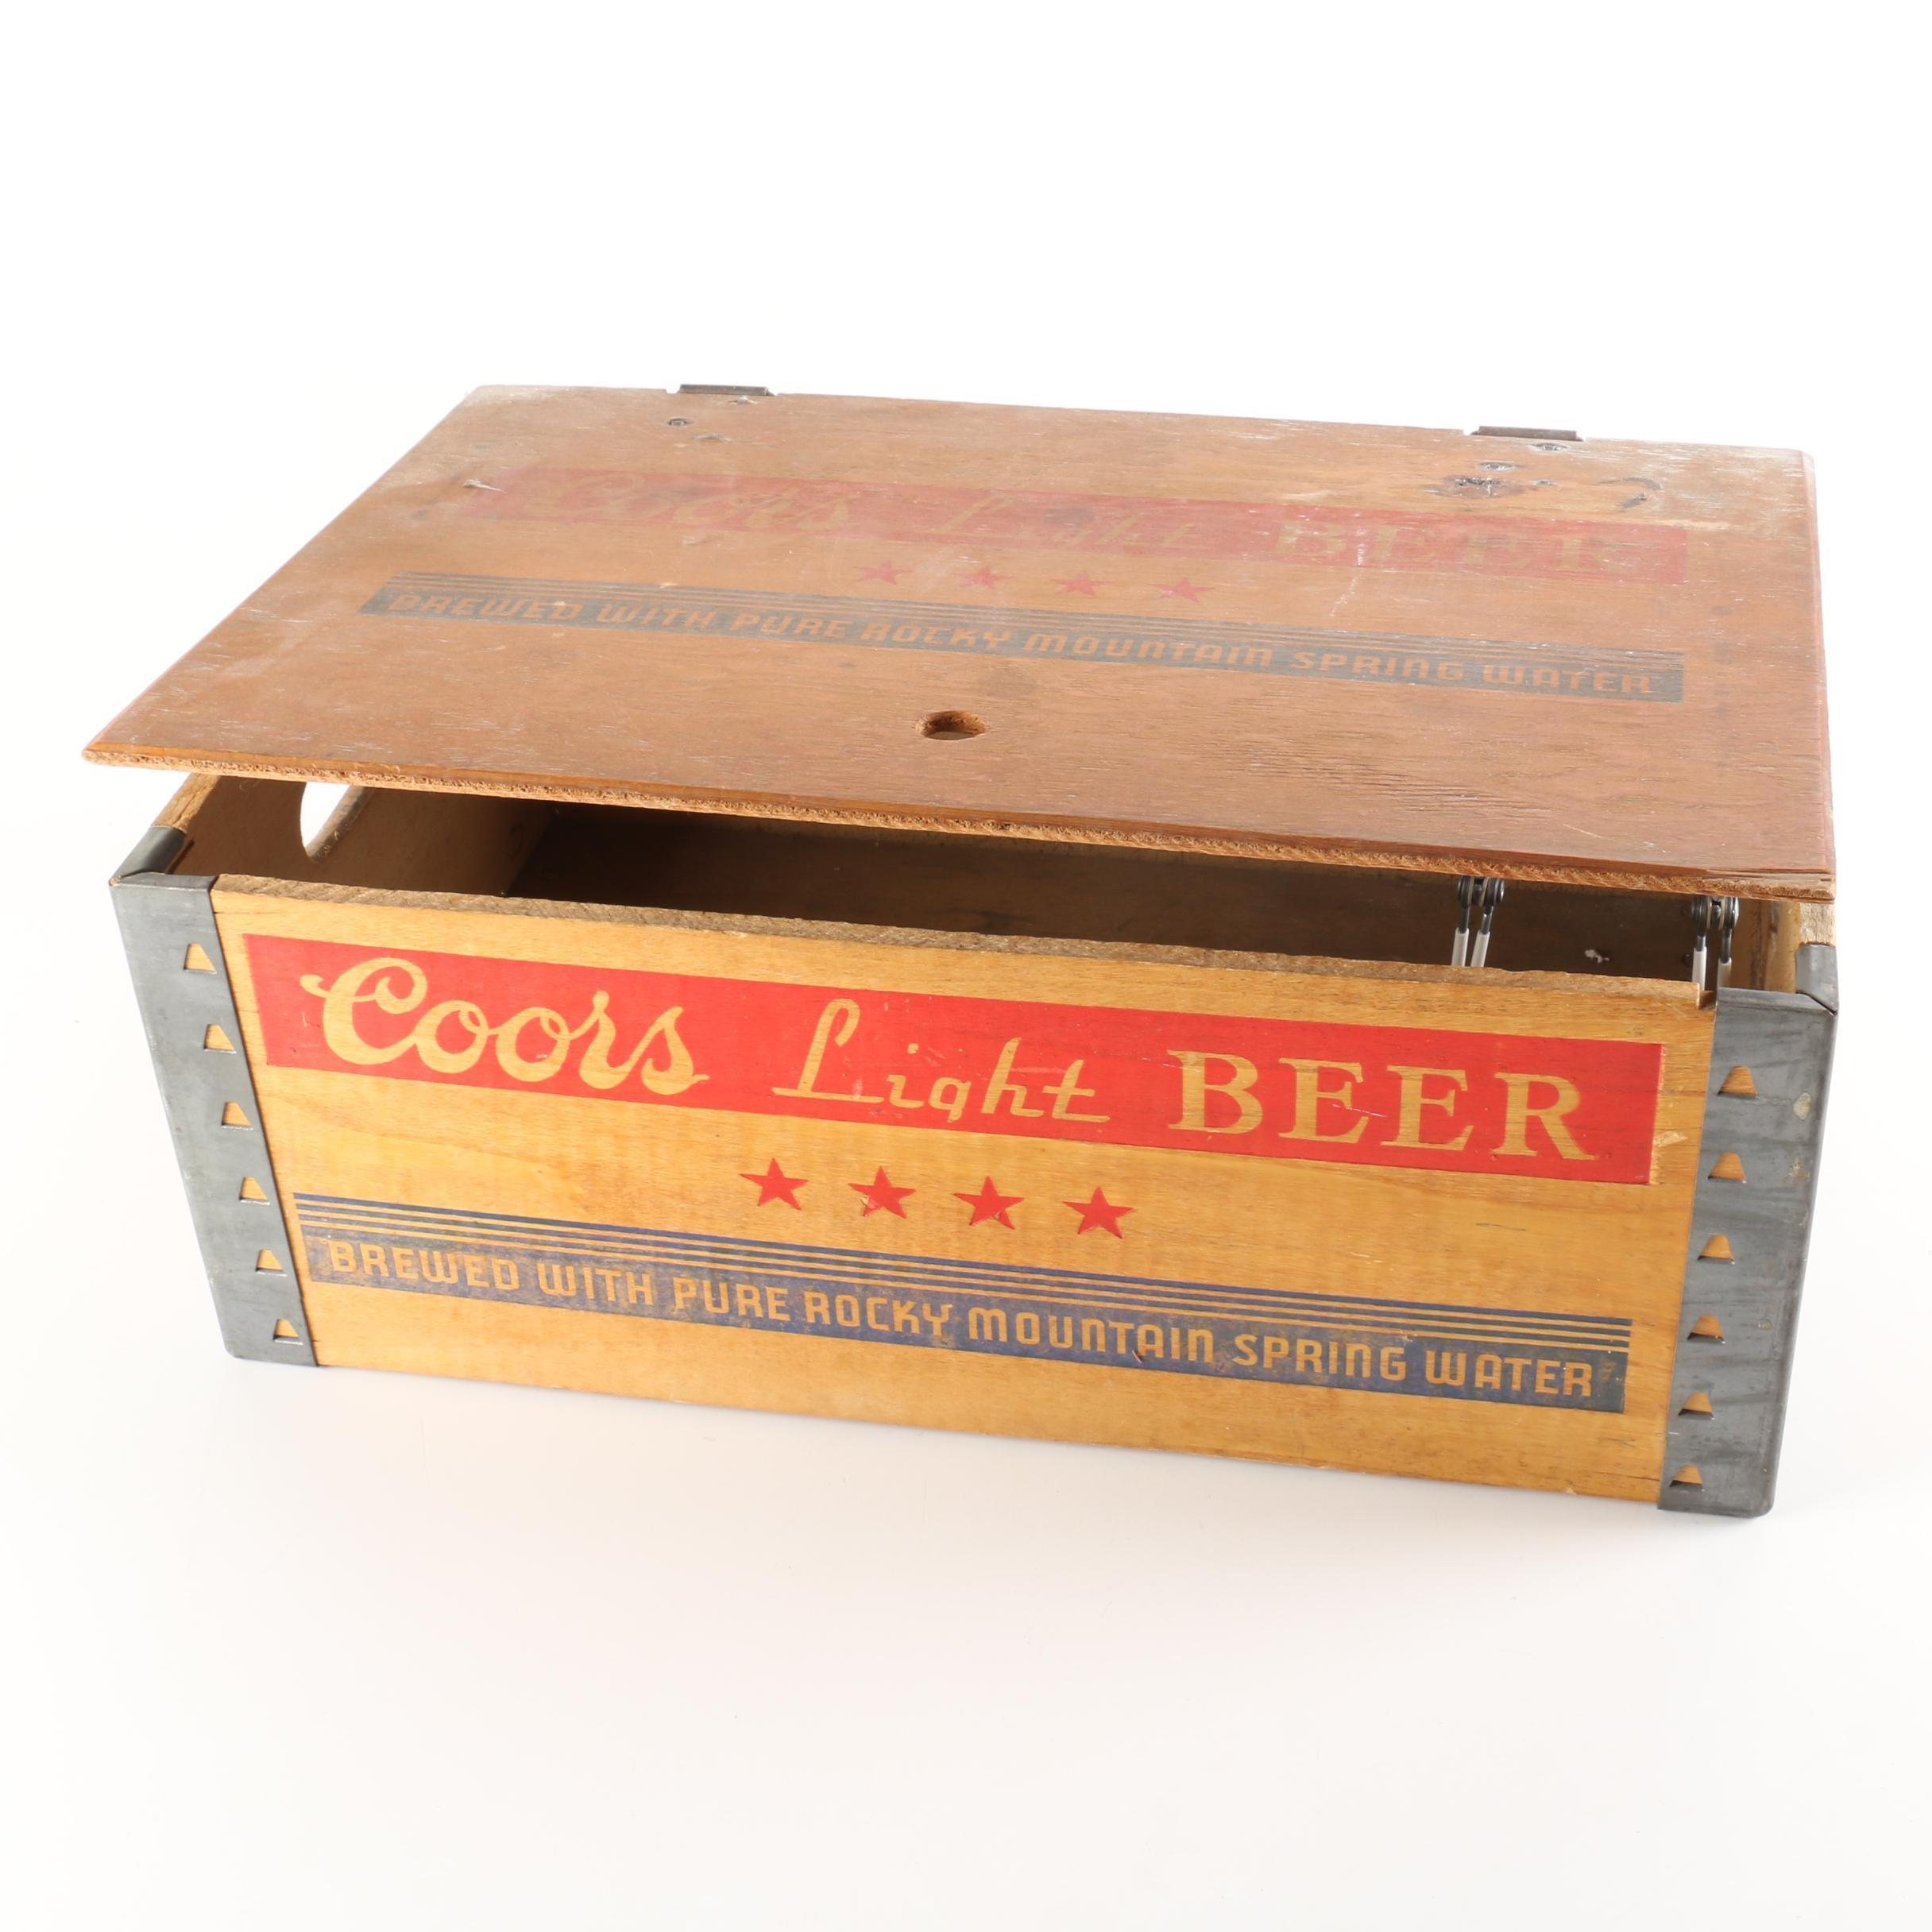 Vintage Coors Light Beer Crate